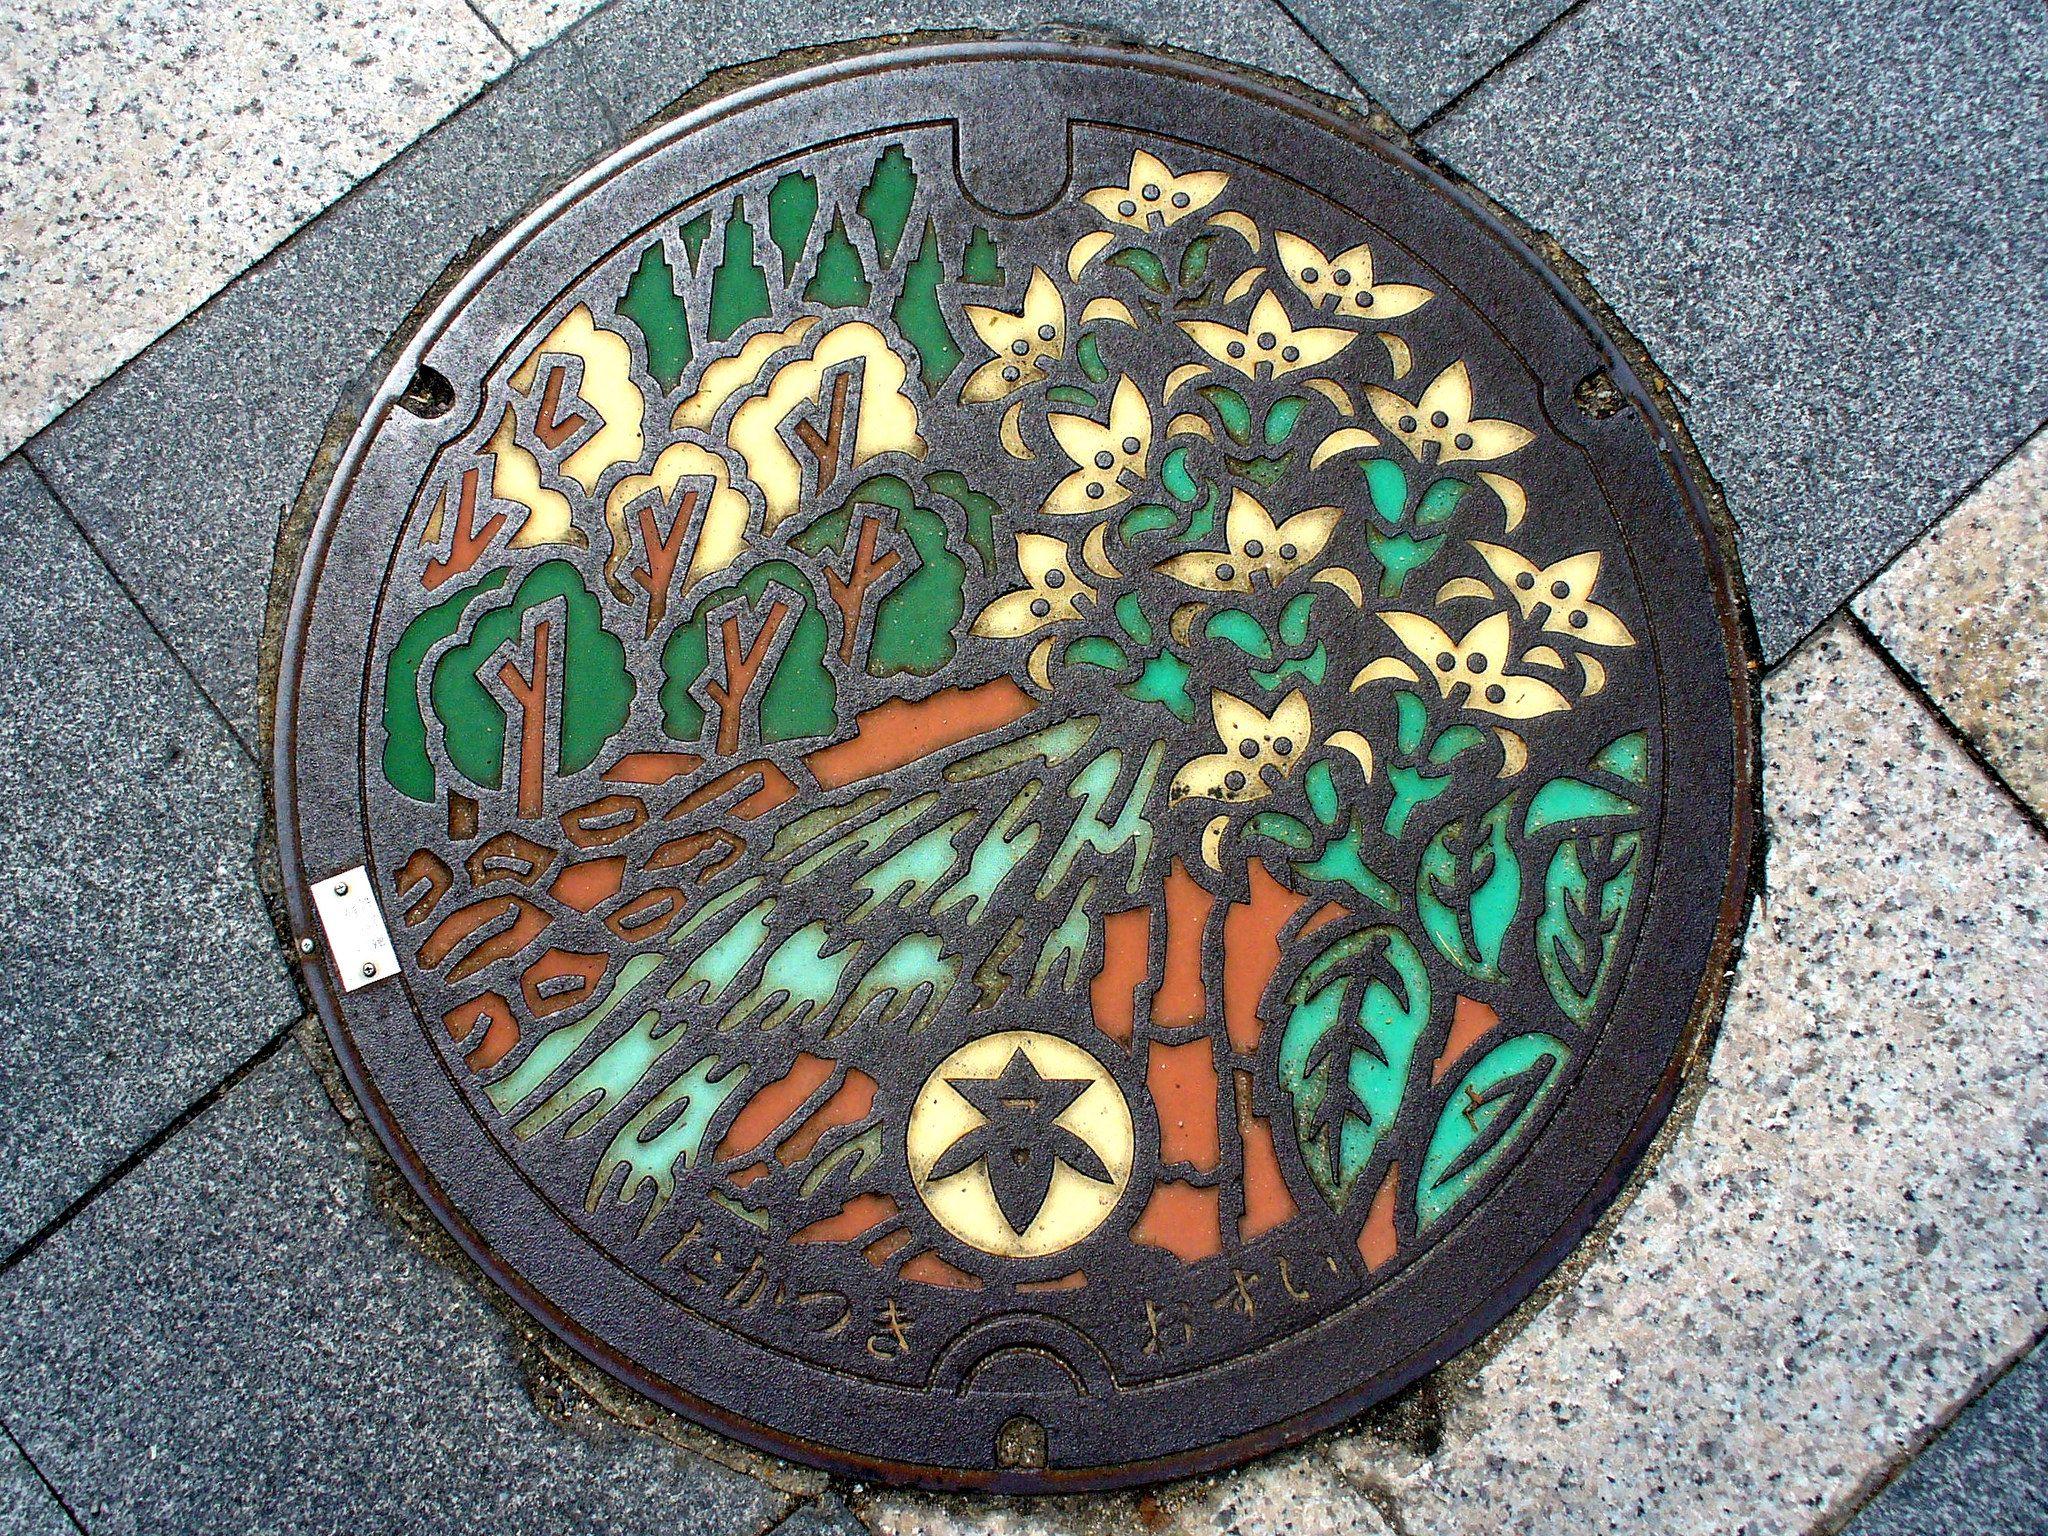 https://flic.kr/p/p7eTU1 | Takatsuki Osaka, manhole cover (大阪府高槻市のマンホール)